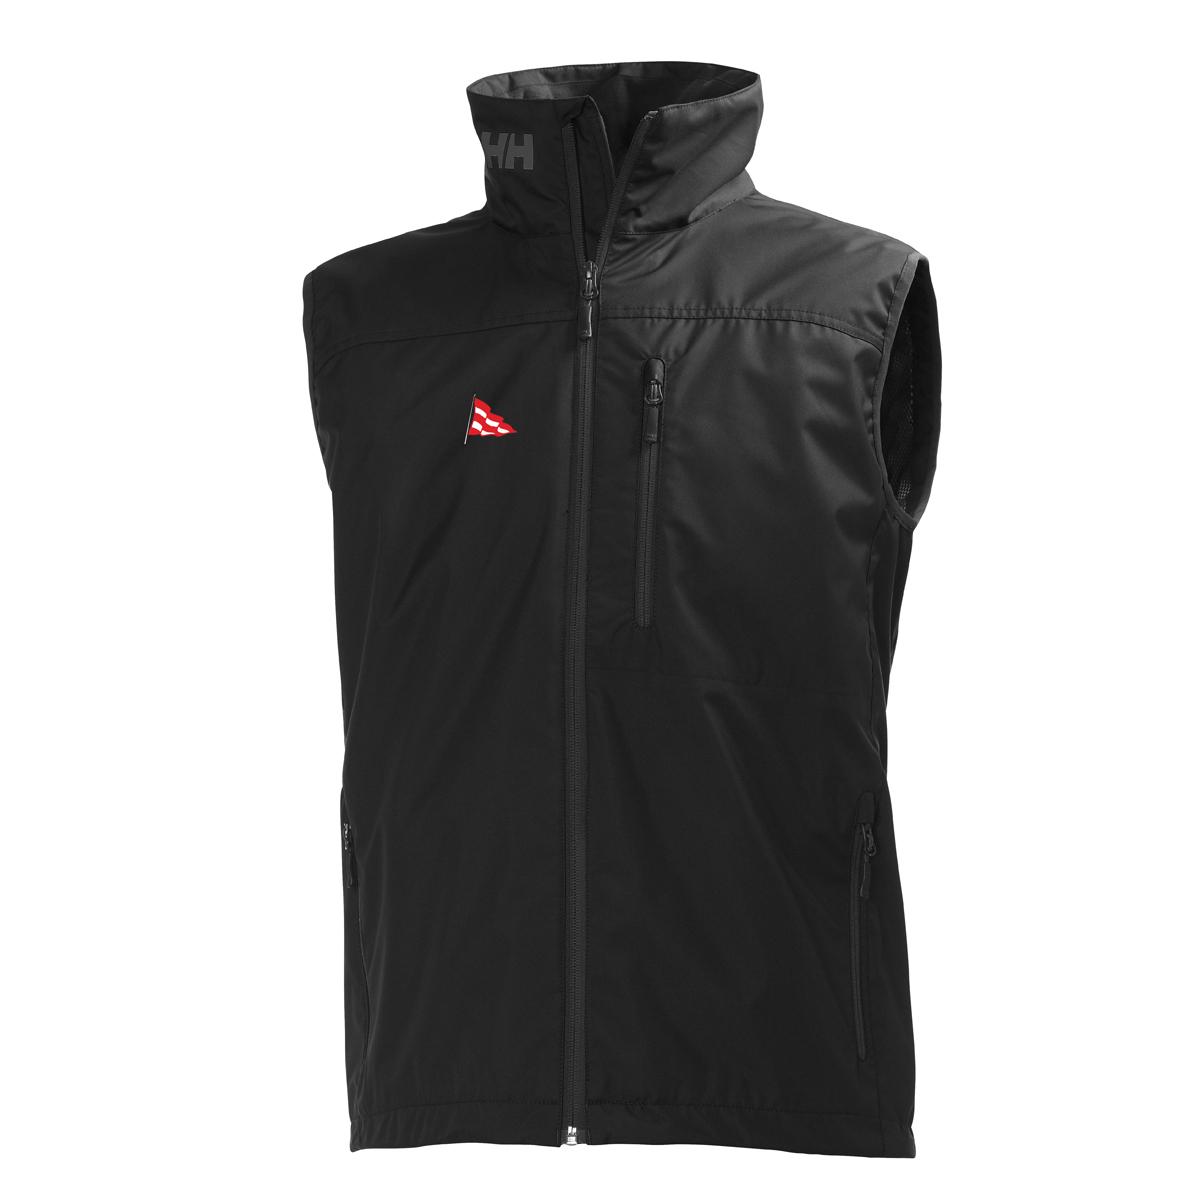 Black Rock Yacht Club - Men's Helly Hansen Crew Vest (BRYC520)